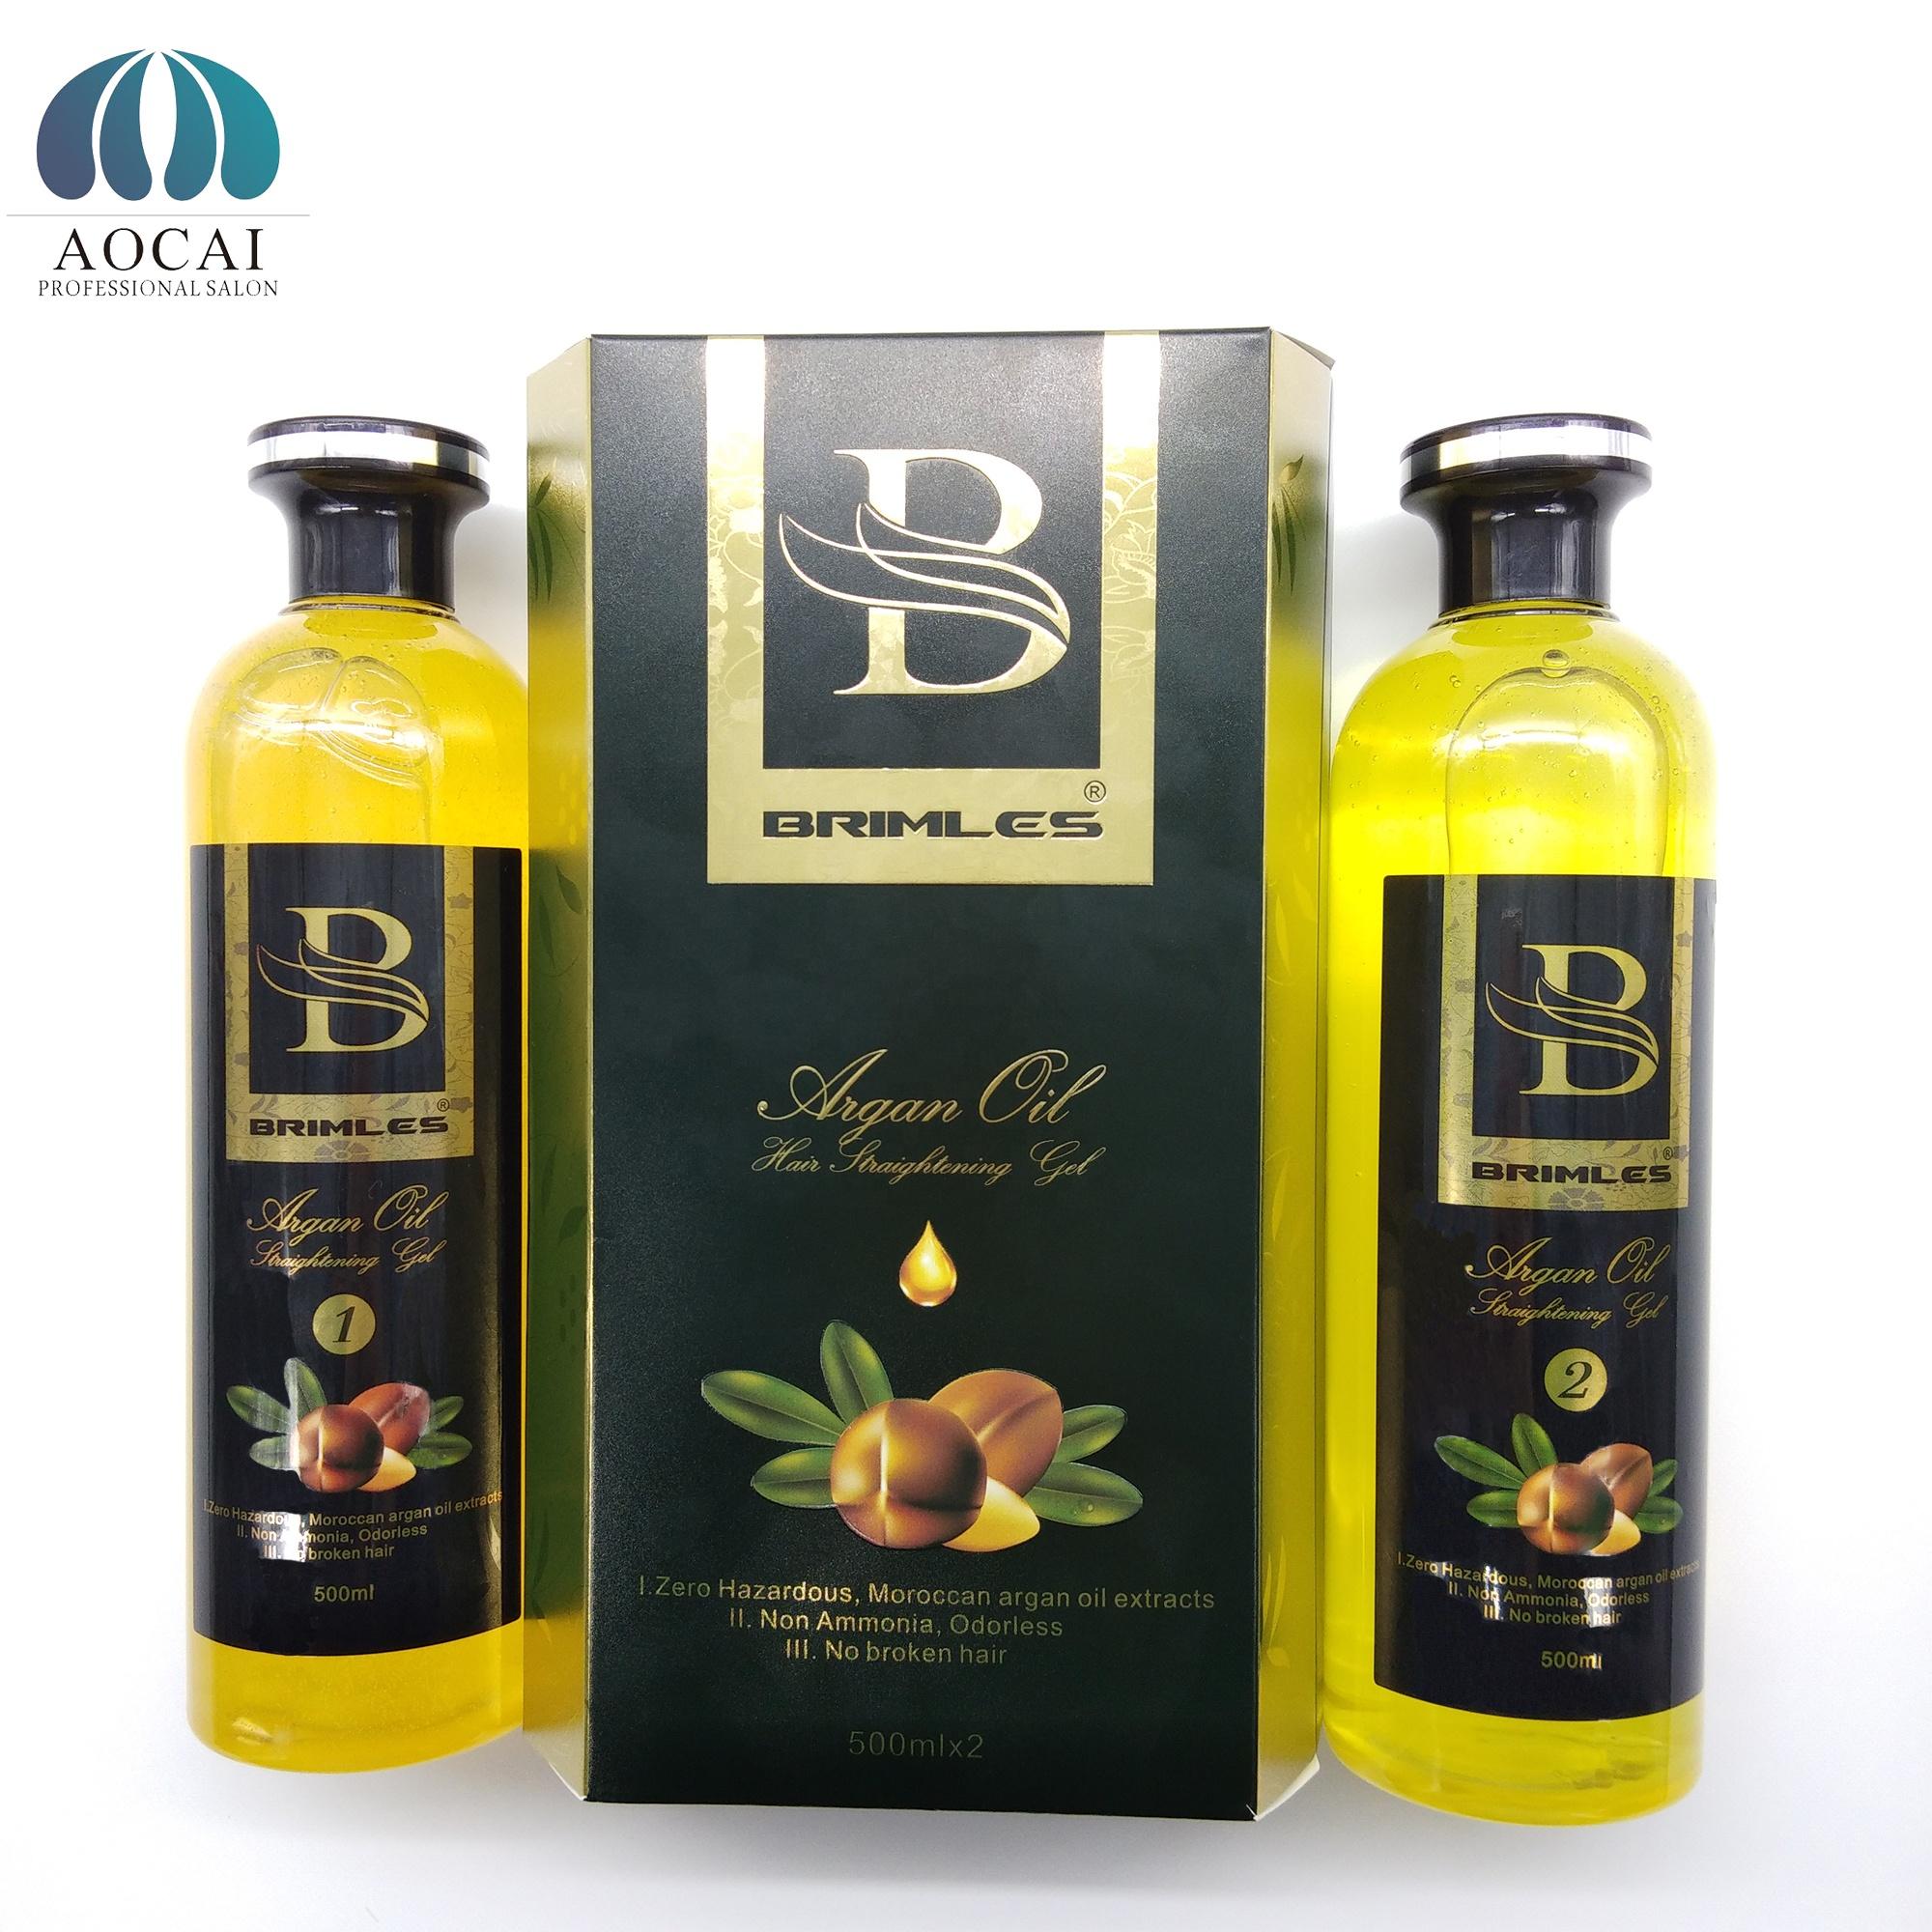 Oem Argan Oil Hair Styling Gel Products Hair Straightener Gel Buy Make Hair Straight Hair Straightener Gel Rebond Cream Product On Alibaba Com